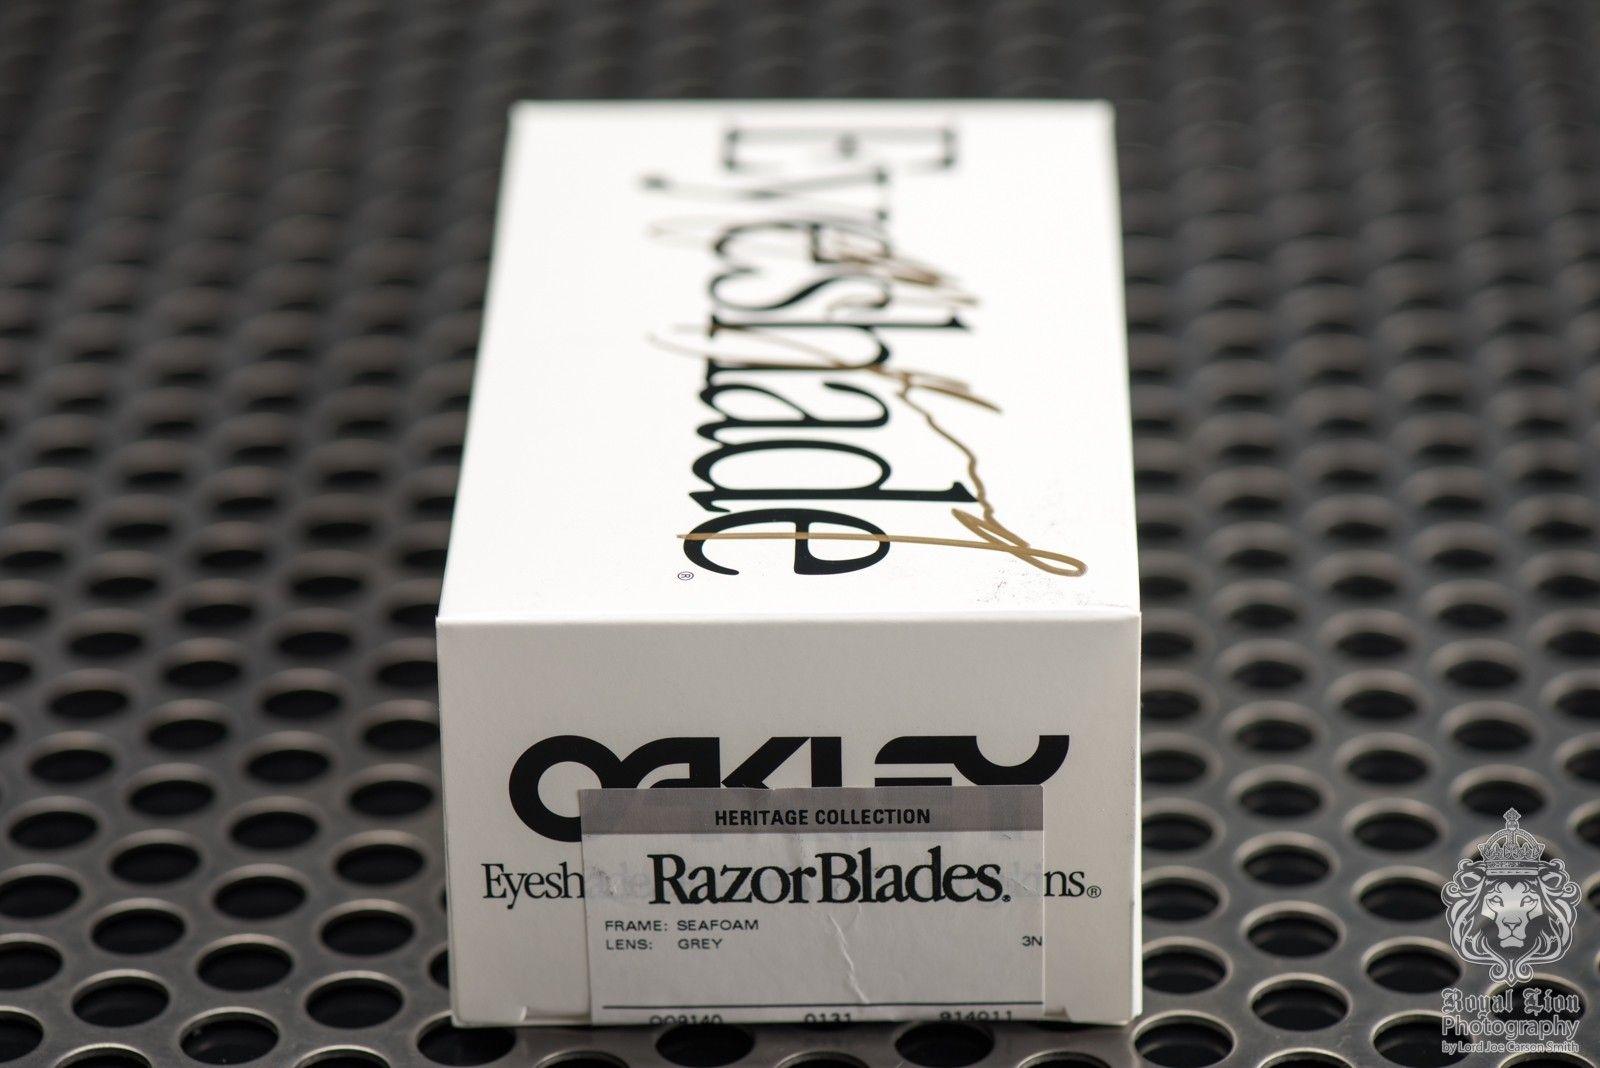 2 of 3 Signed Oakley Heritage Razorblades by Jim Jannard - Seafoam with Grey - ND8_3477.jpg